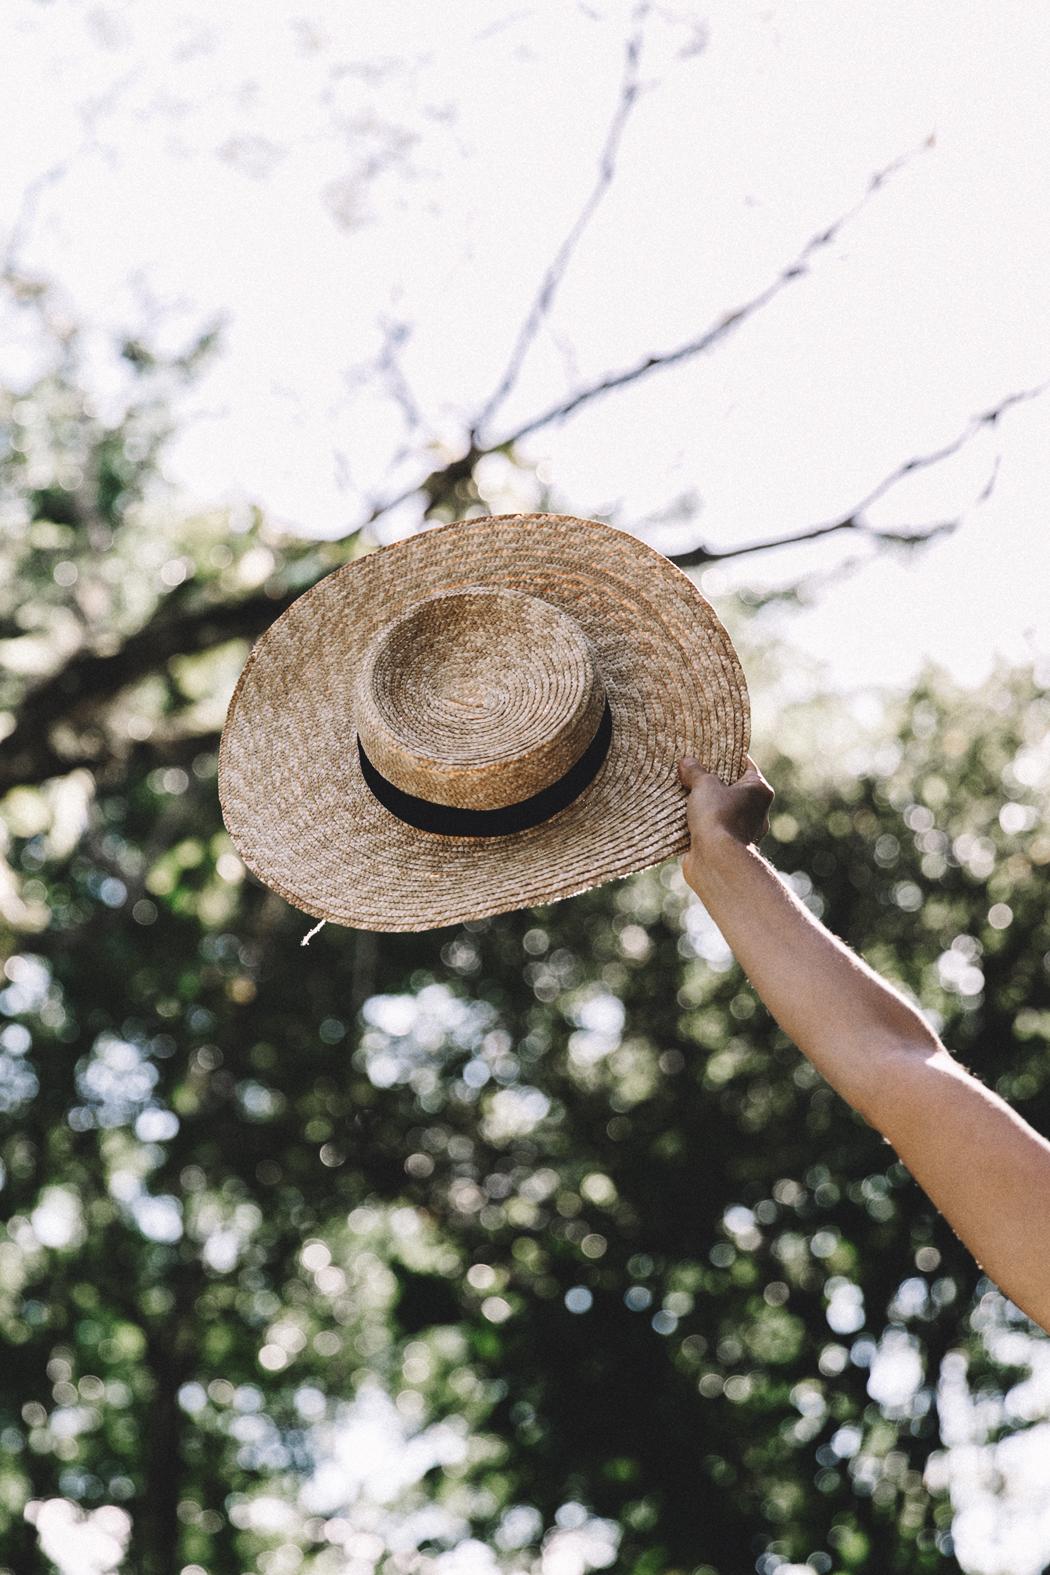 YS_FALLS-Jamaica-Peony_Swimwear-Lack_Of_Colors_Hat-Straw_Hat-Swimwear_Bikini-Outfit-53